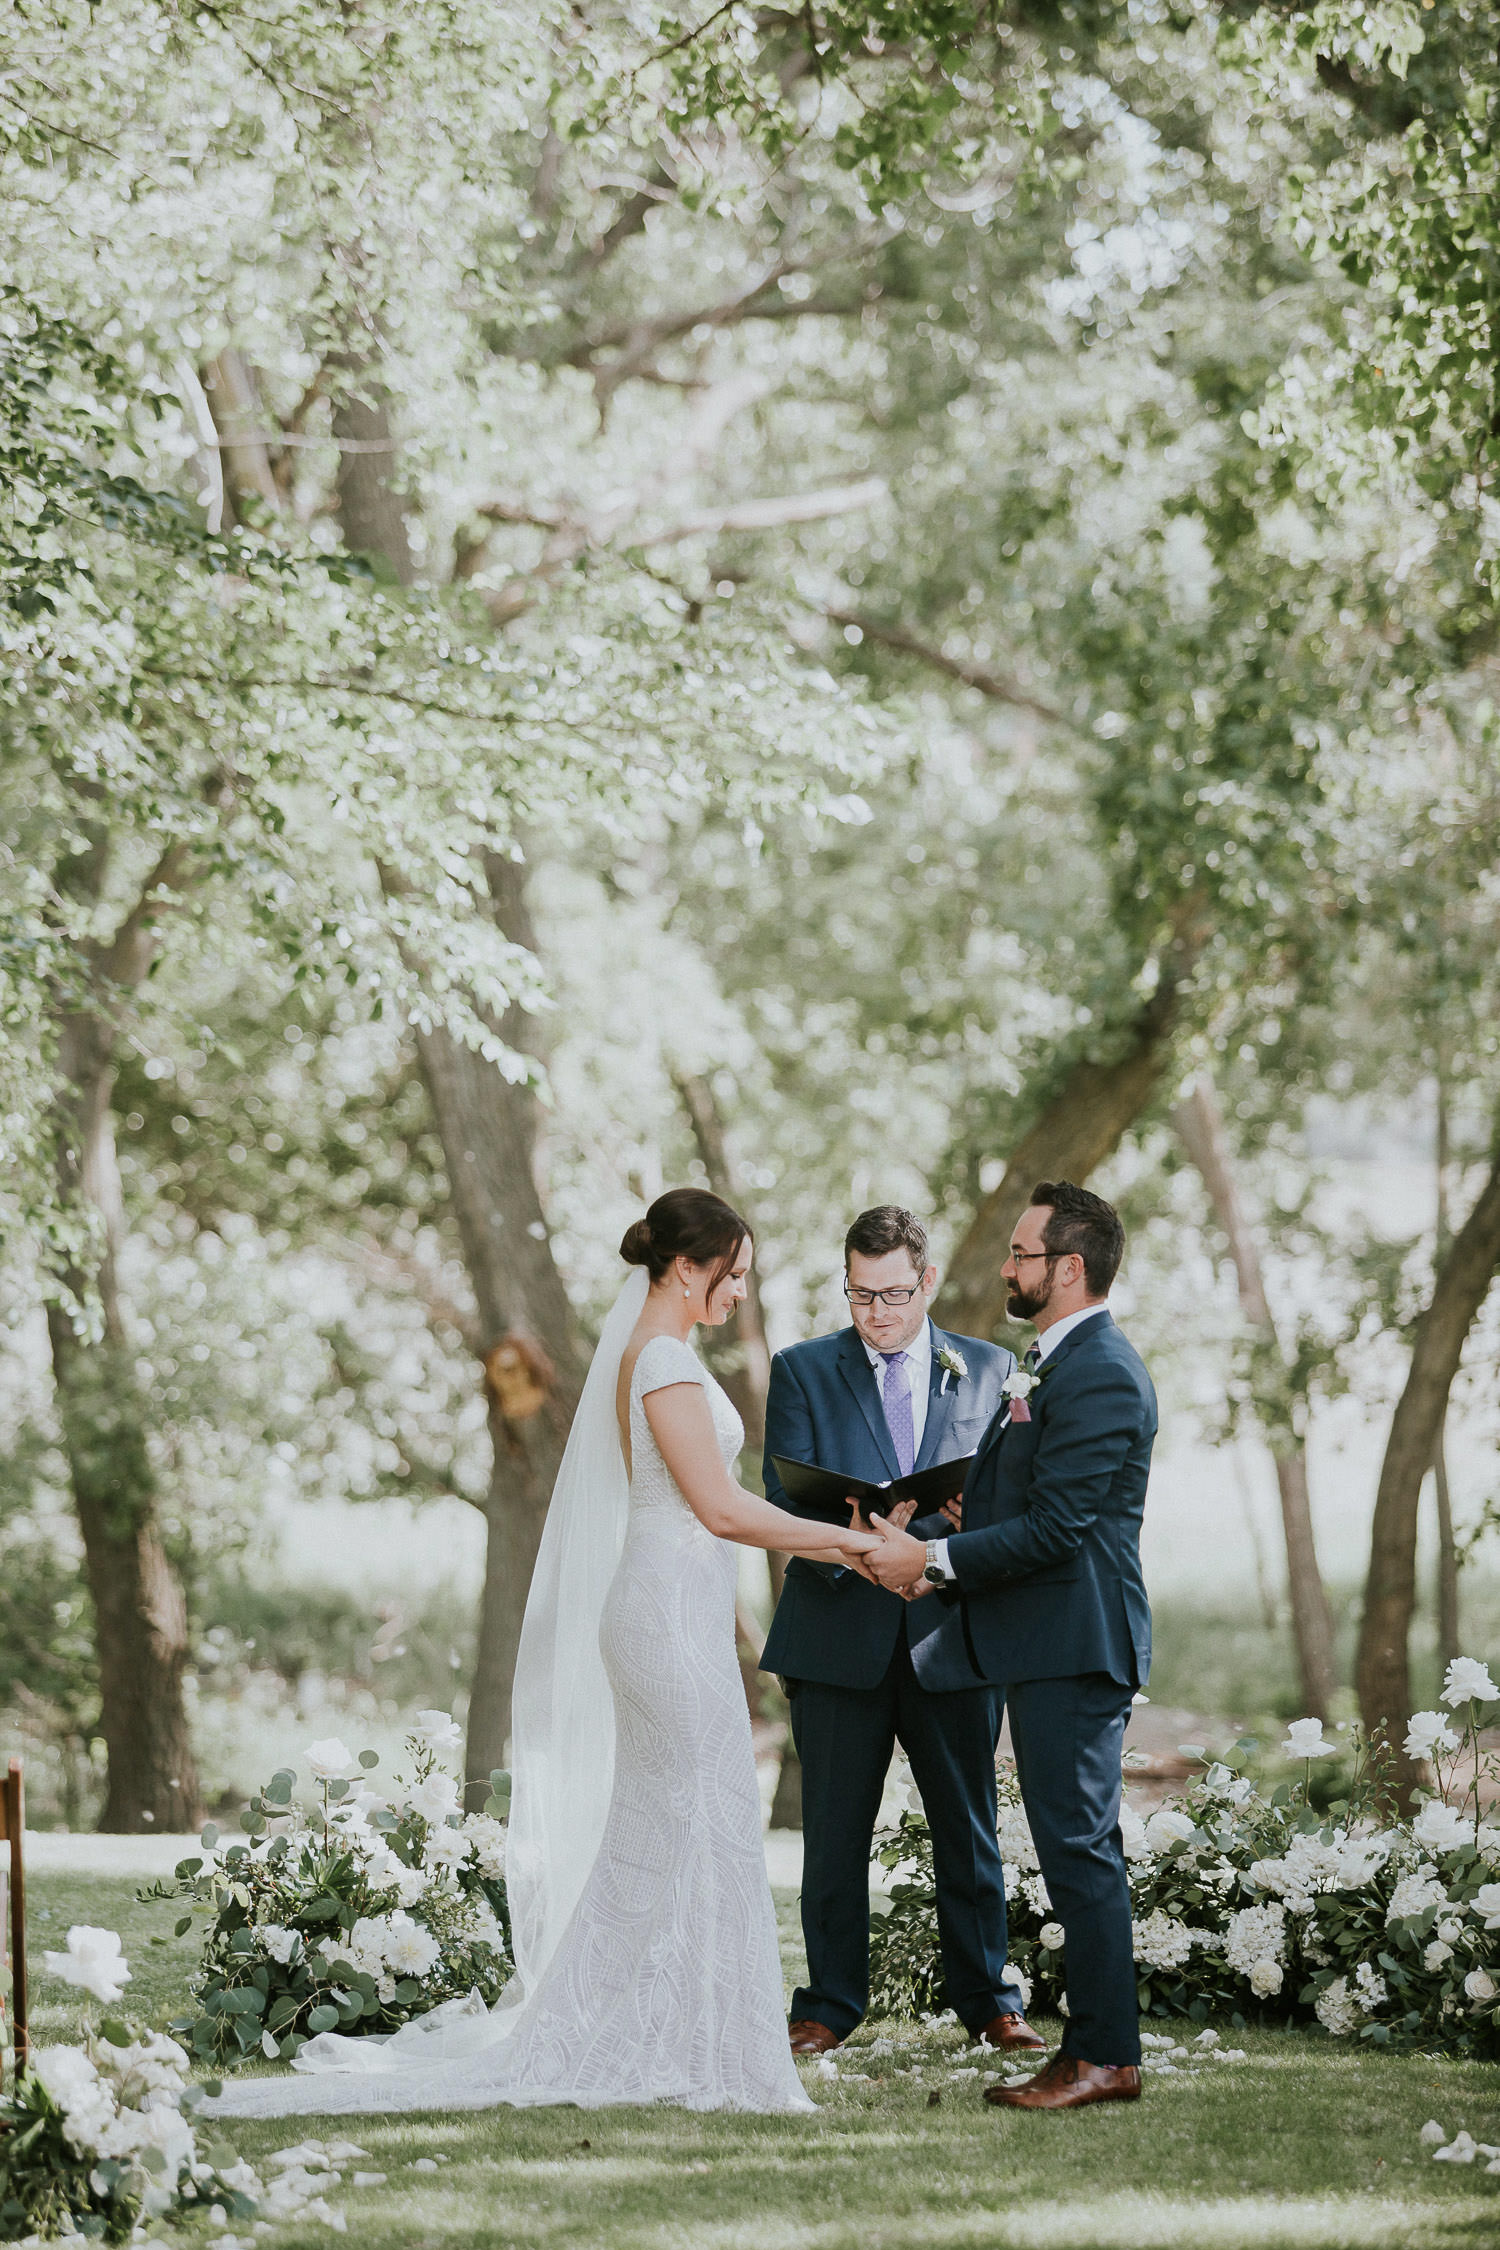 summer-backyard-wedding-in-alberta-sarah-pukin-0095